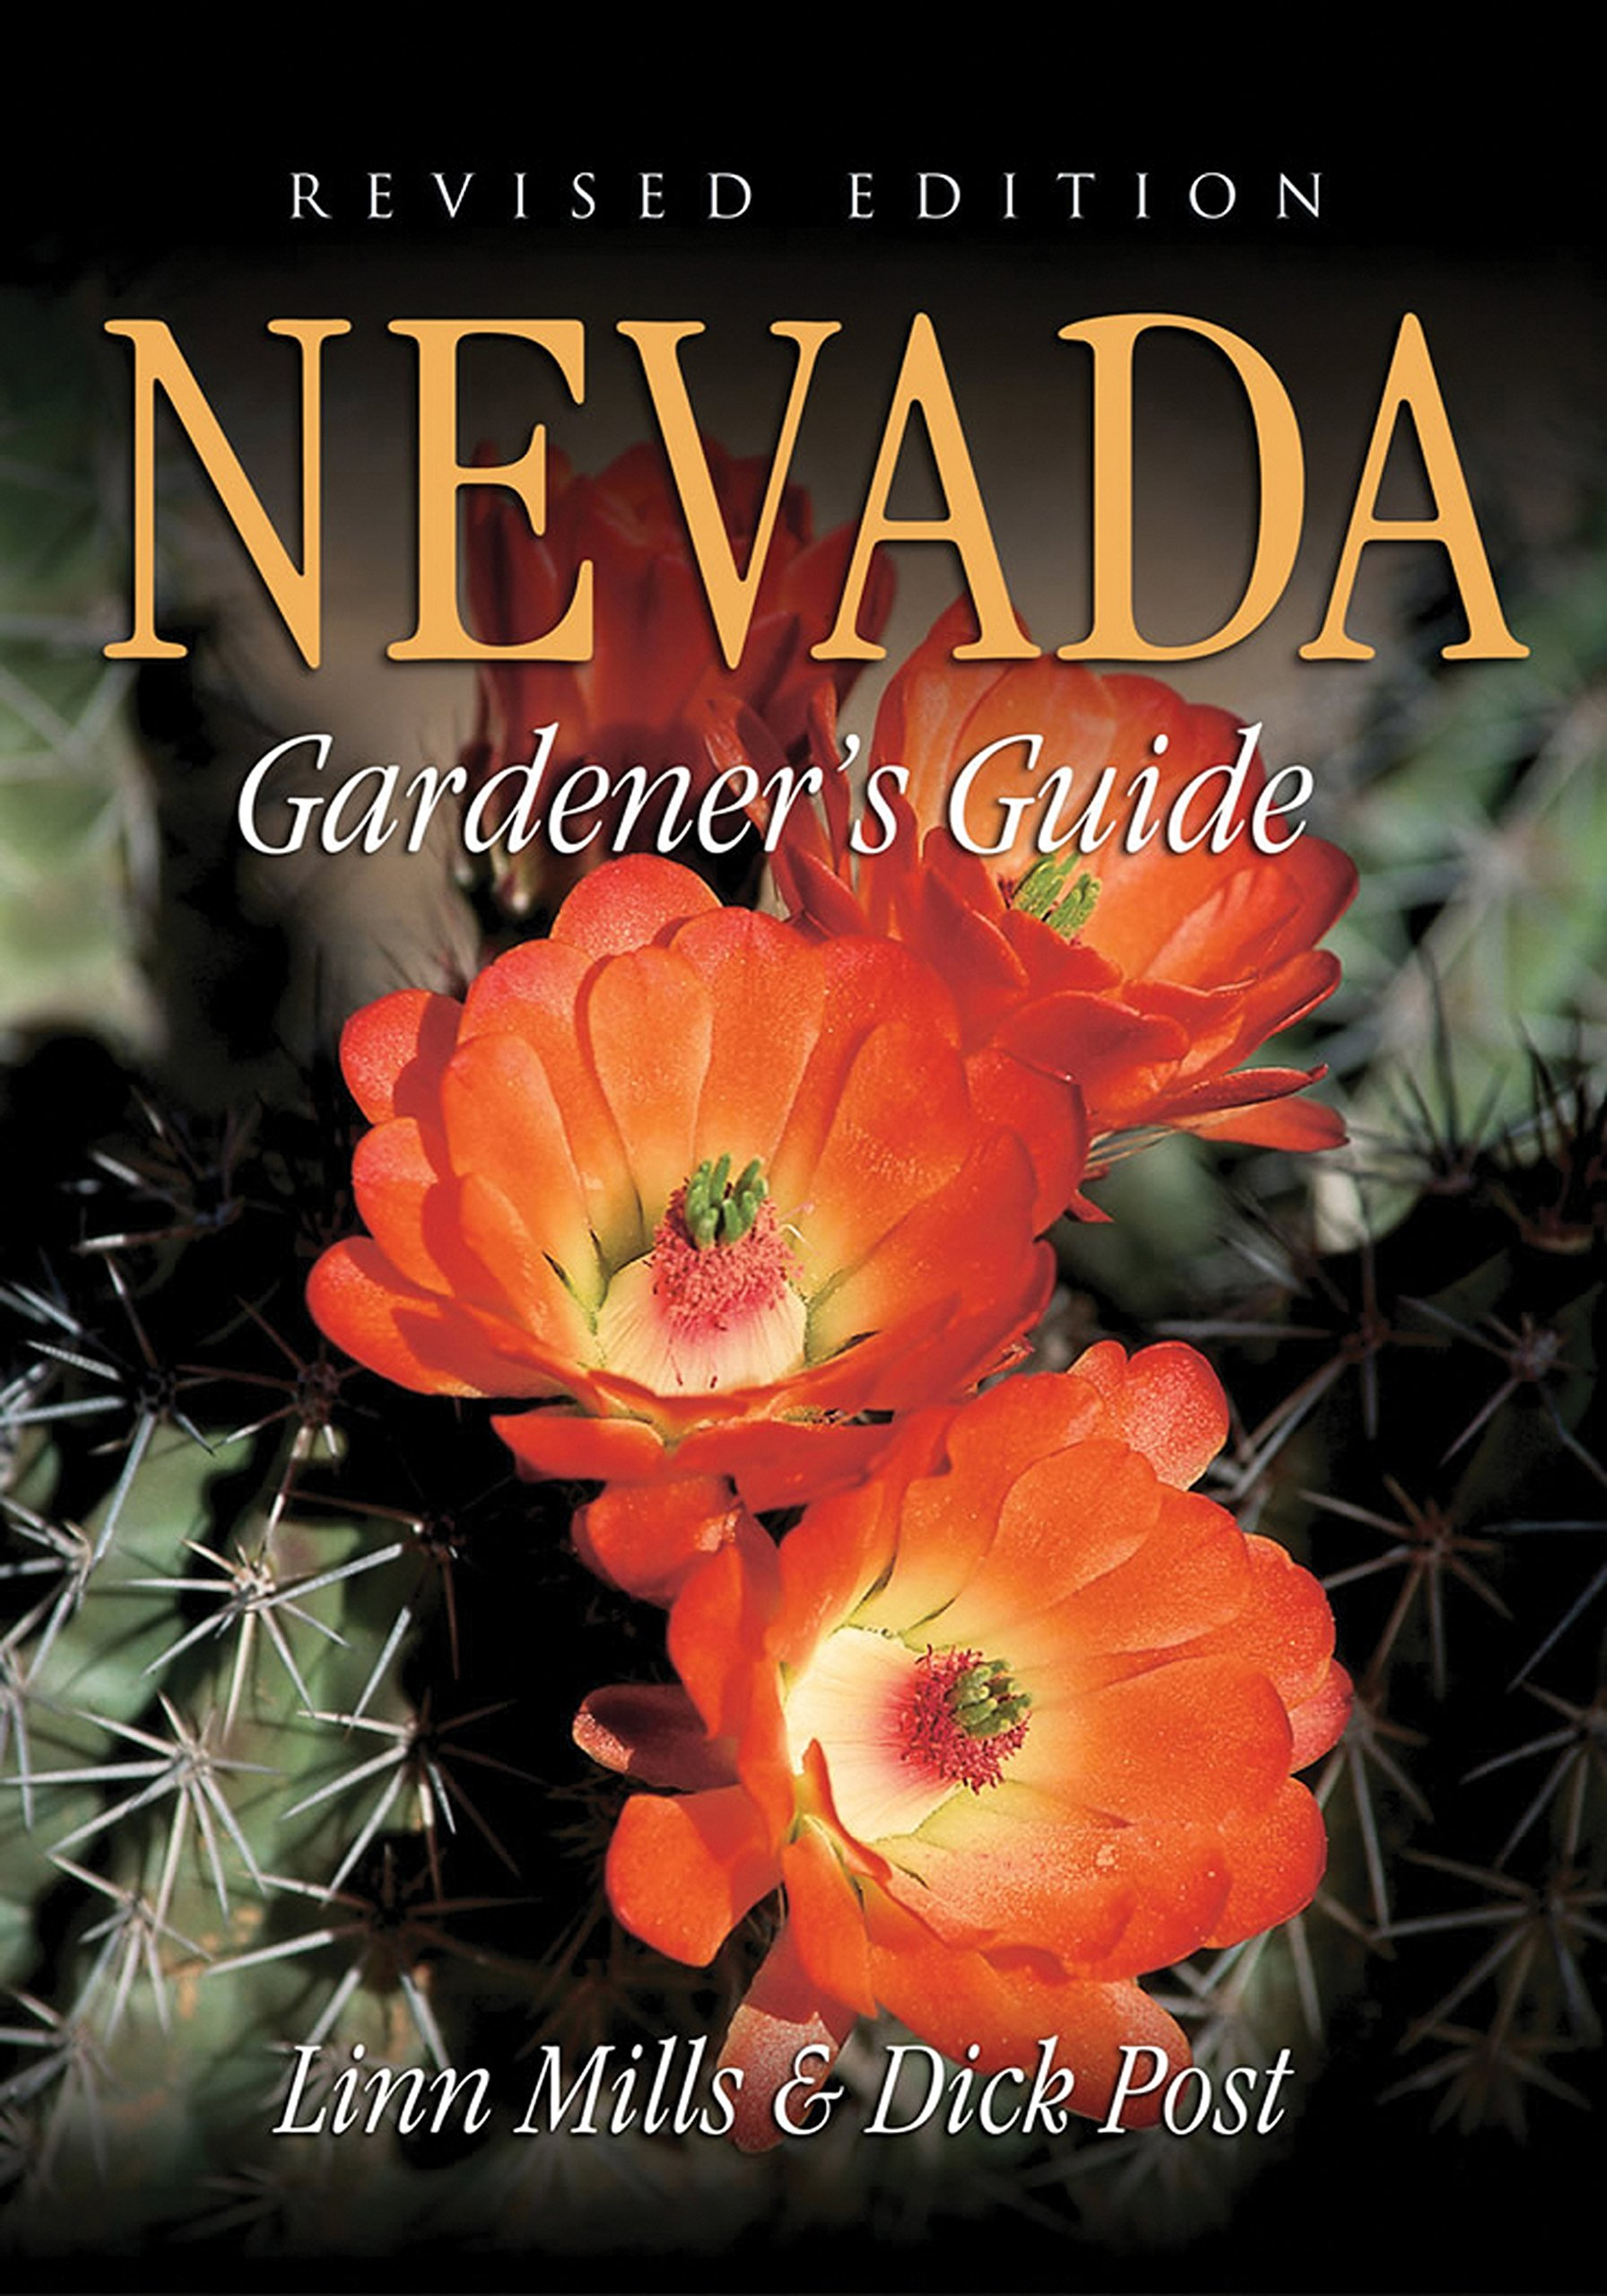 Nevada Gardeneru0027s Guide (Gardeneru0027s Guides): Linn Mills: 9781591861164:  Amazon.com: Books